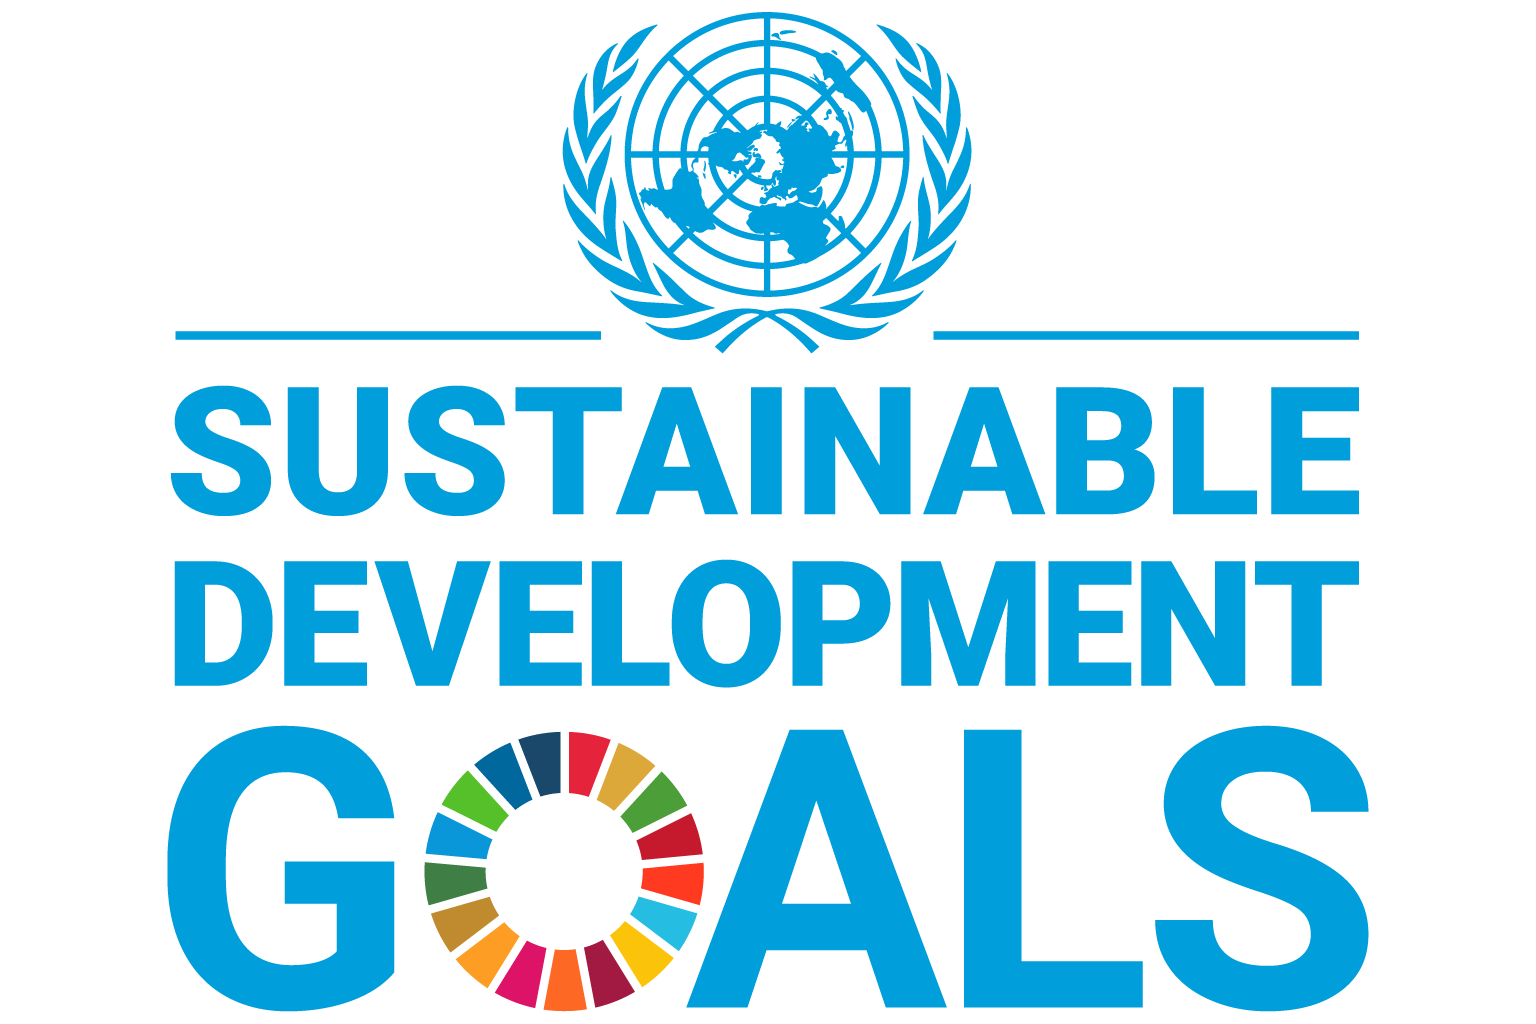 Sustainable Development Goals horizontal logo